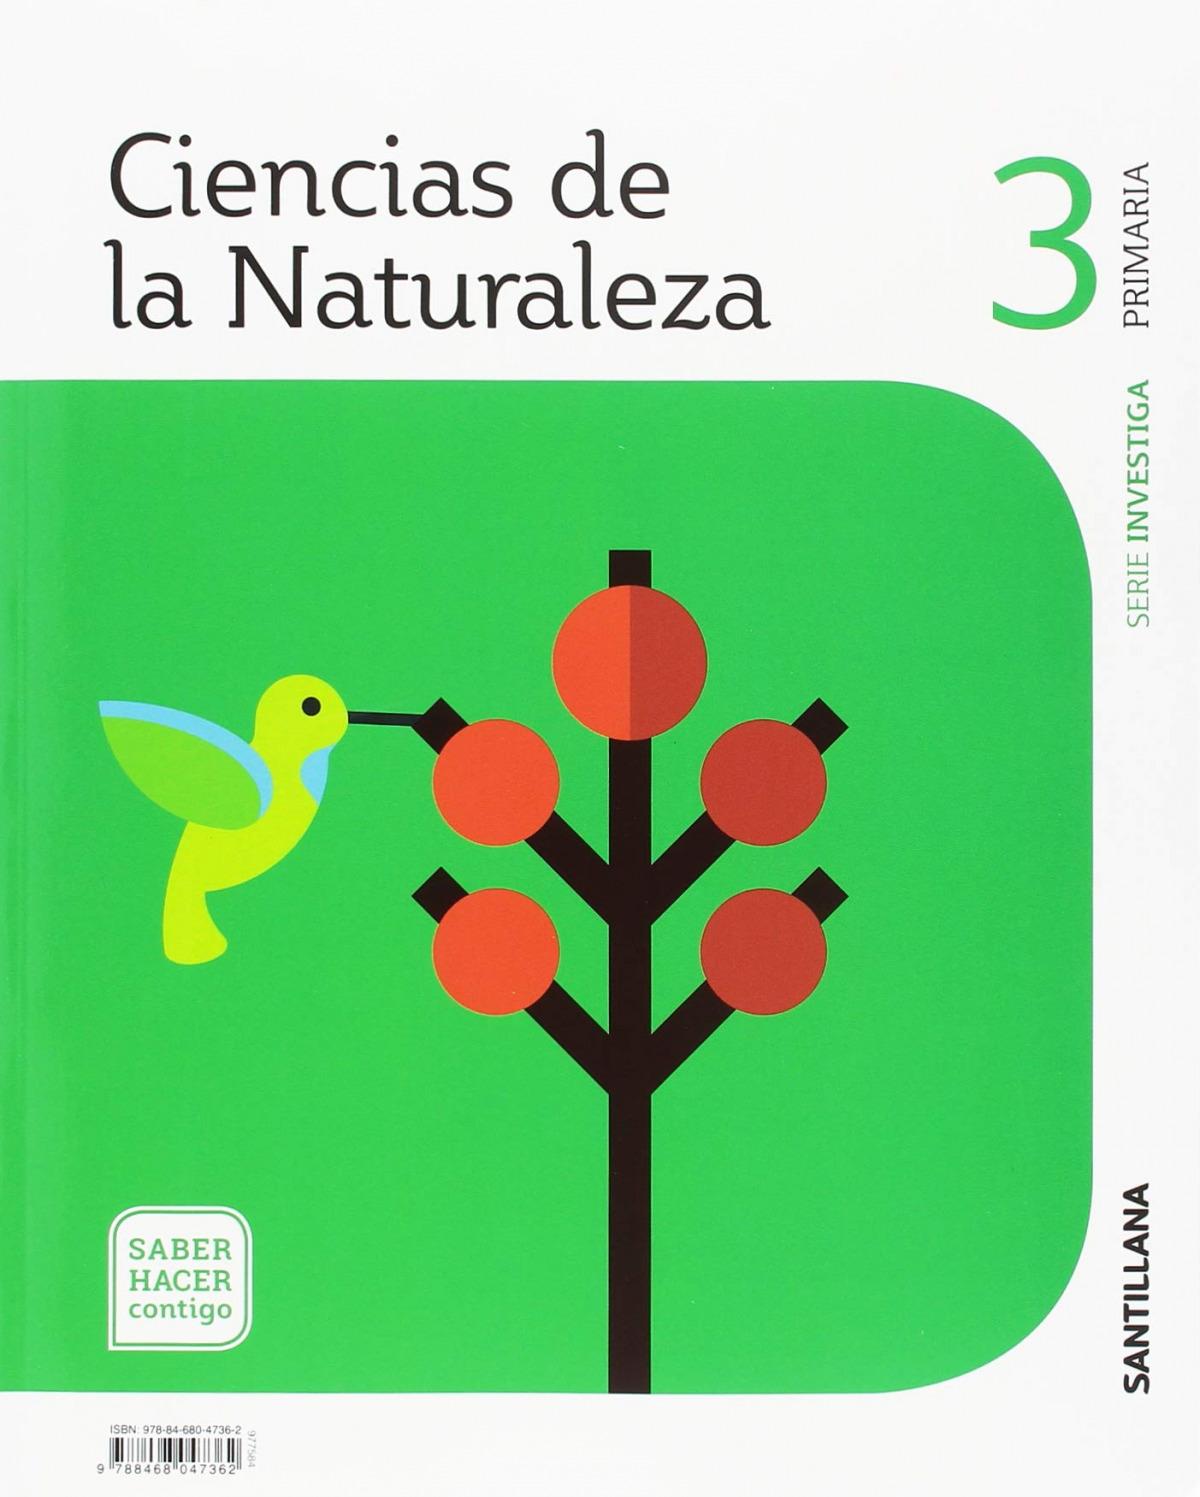 CIENCIAS NATURALES 3o.PRIMARIA. INVESTIGA. SABER HACER CONTIGO 9788468047362